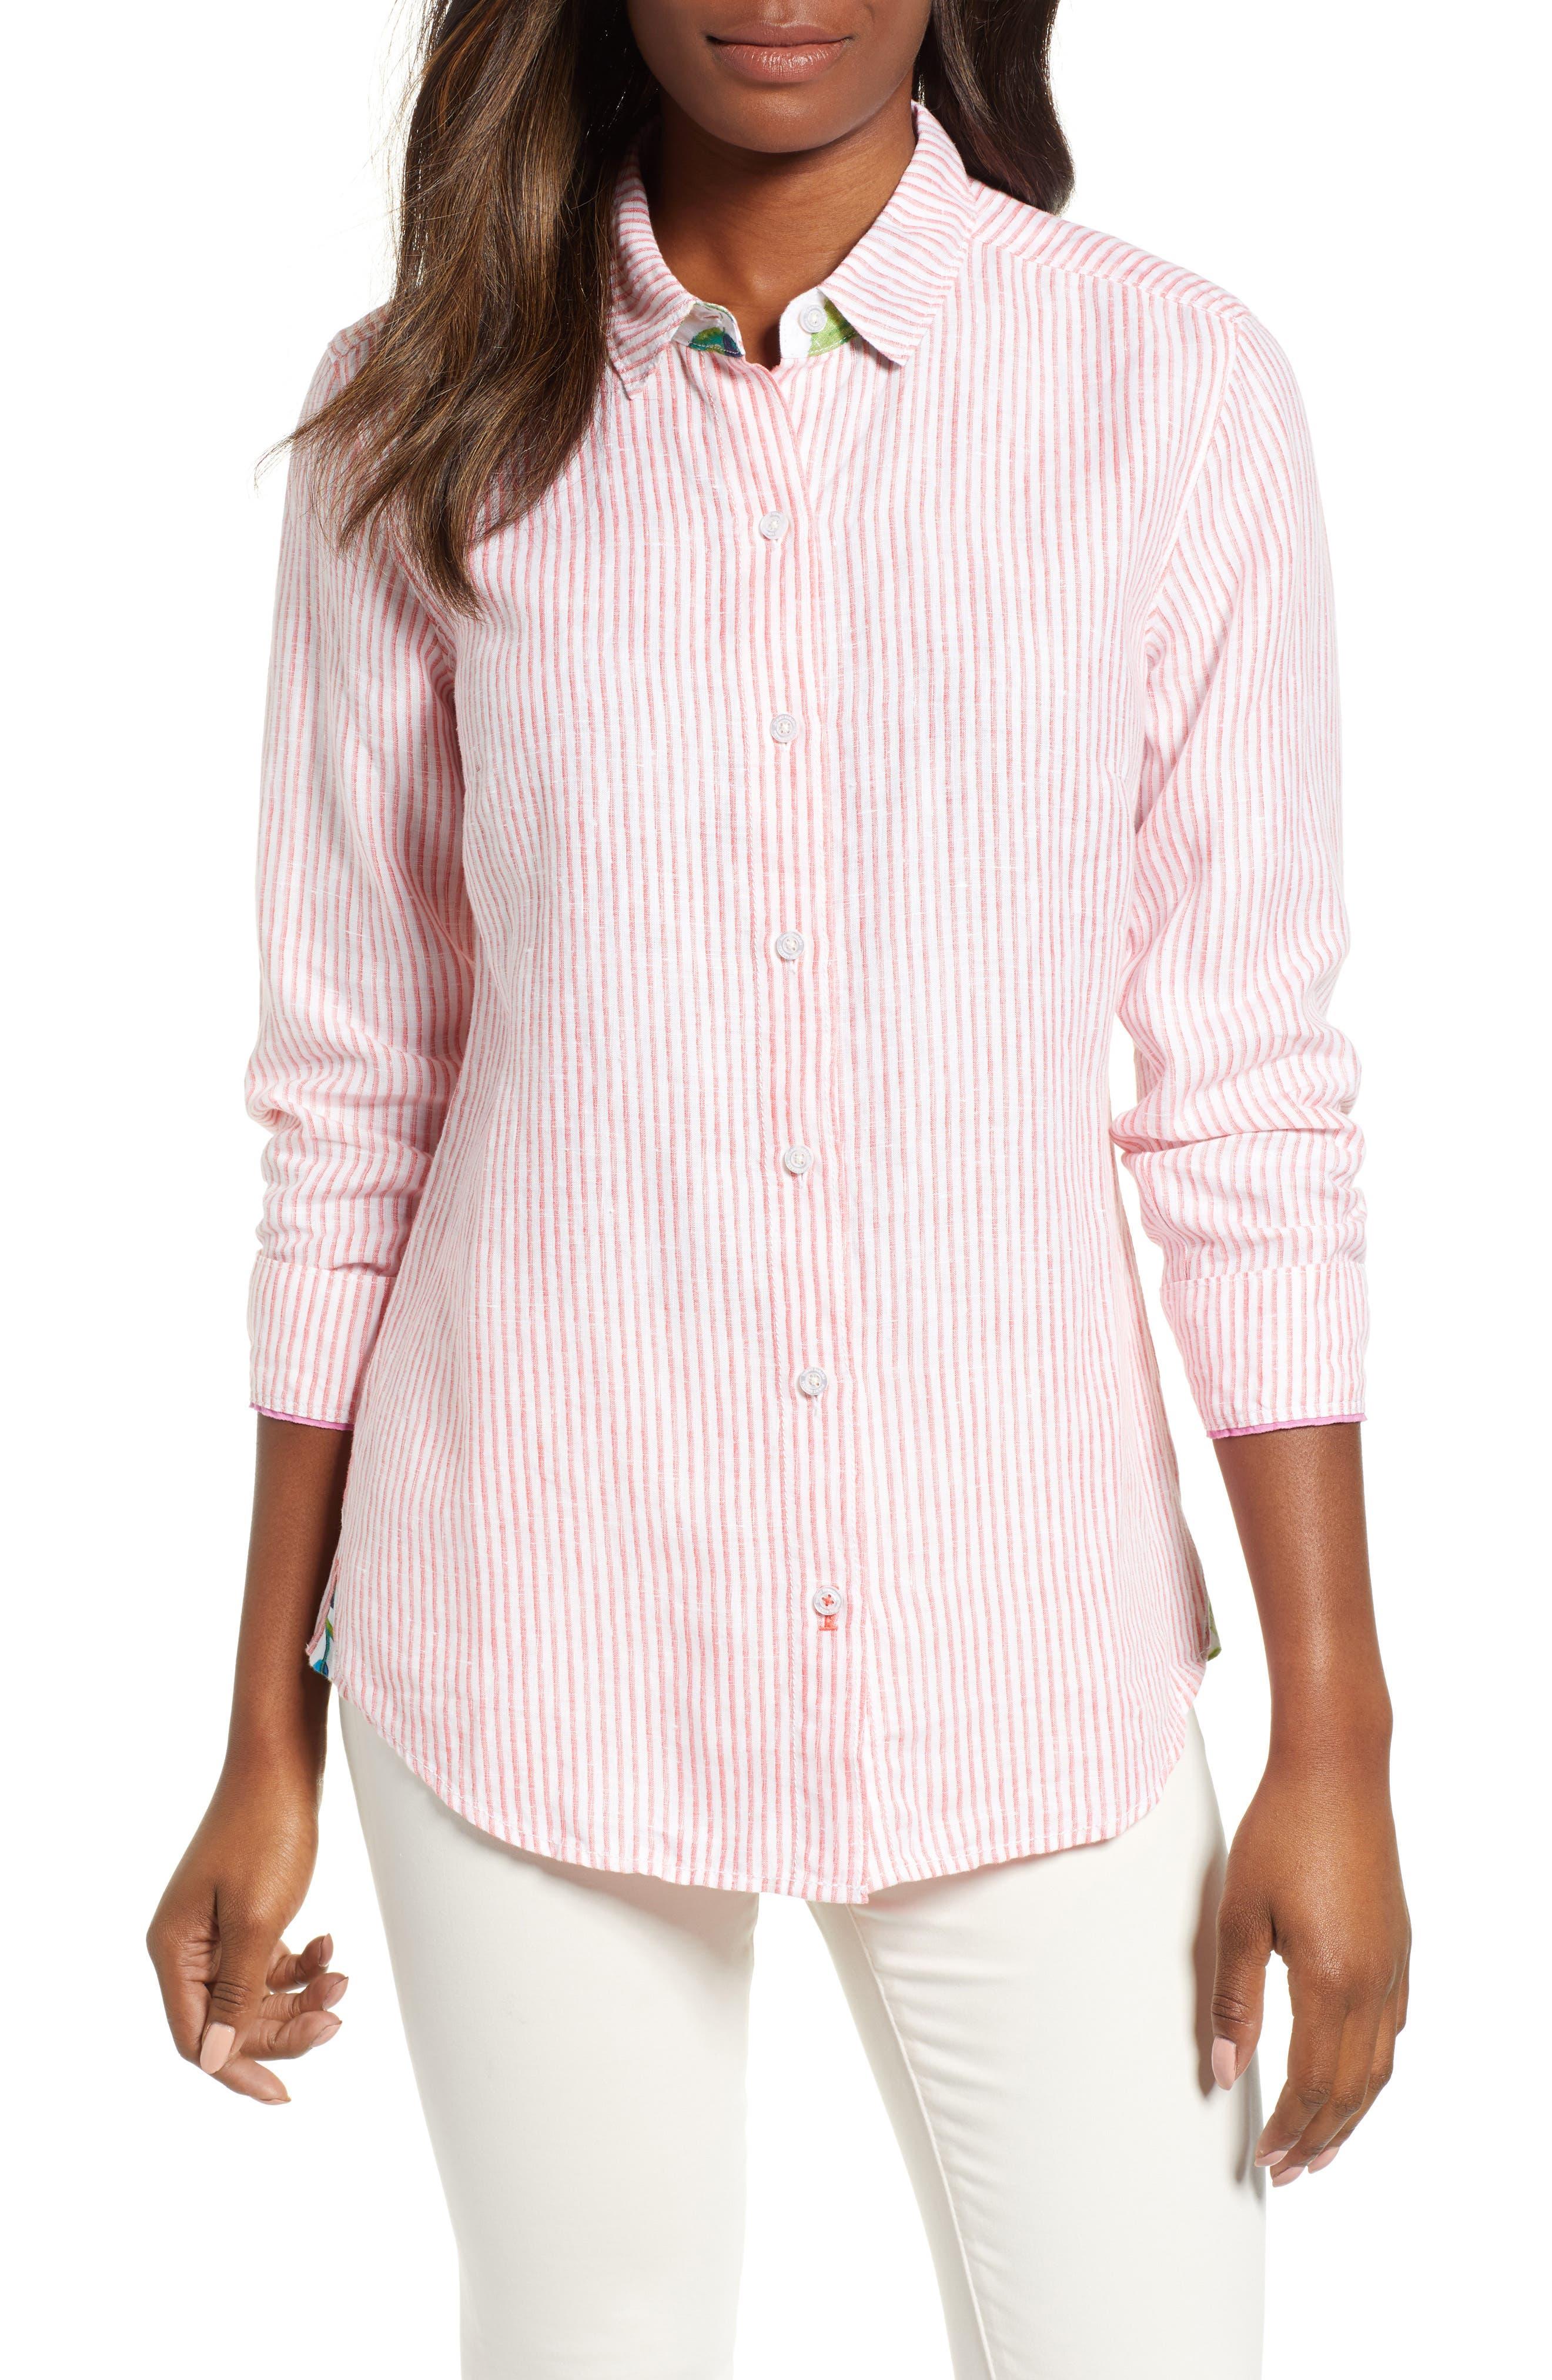 Crystalline Waters Long Sleeve Shirt,                             Main thumbnail 1, color,                             DUBARRY CORAL